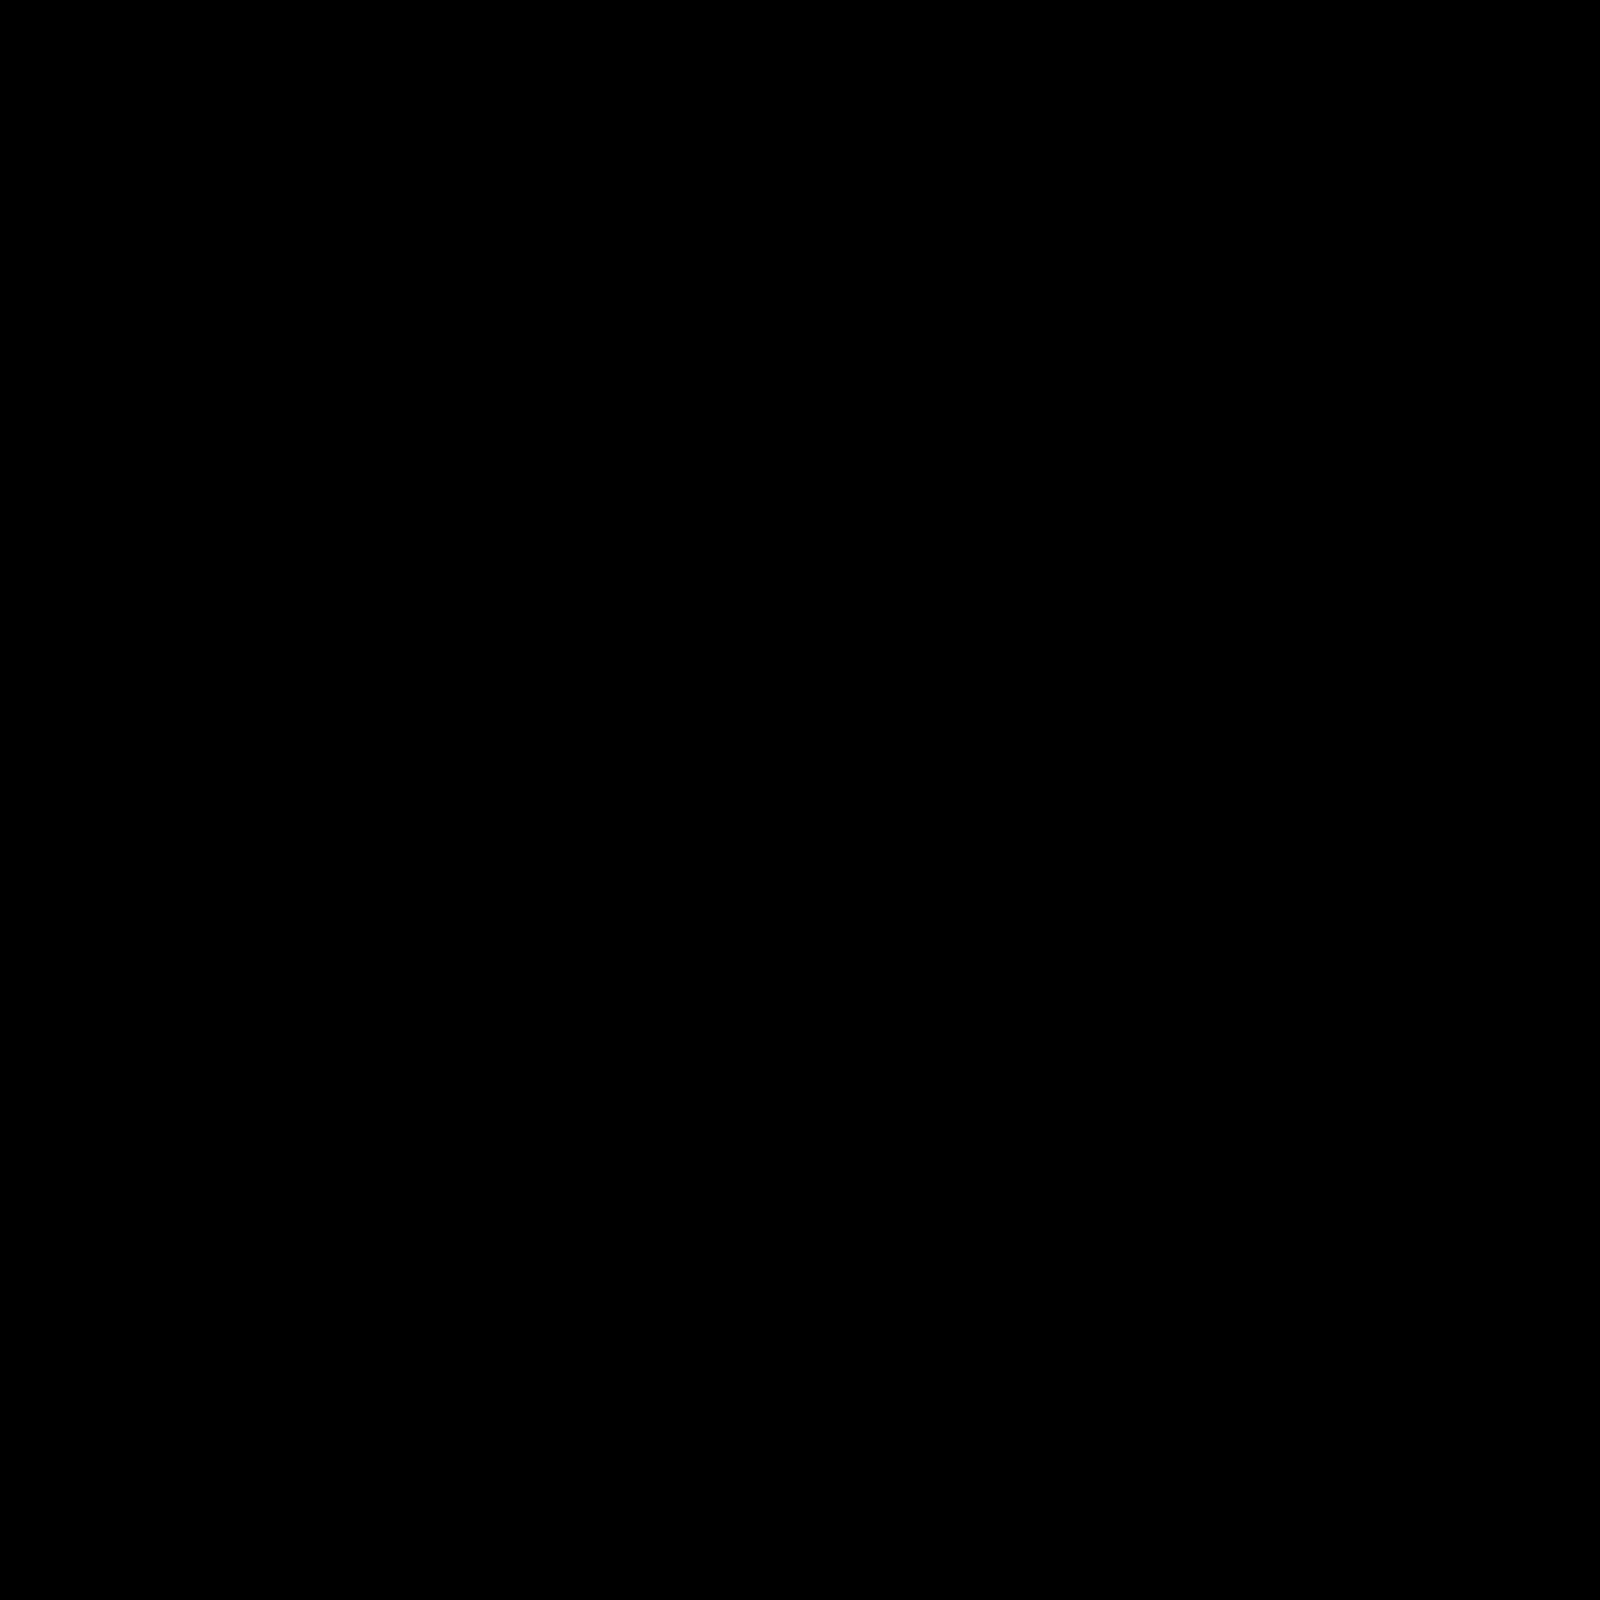 Black Star Png Image Black Star Geometric Star Clip Art